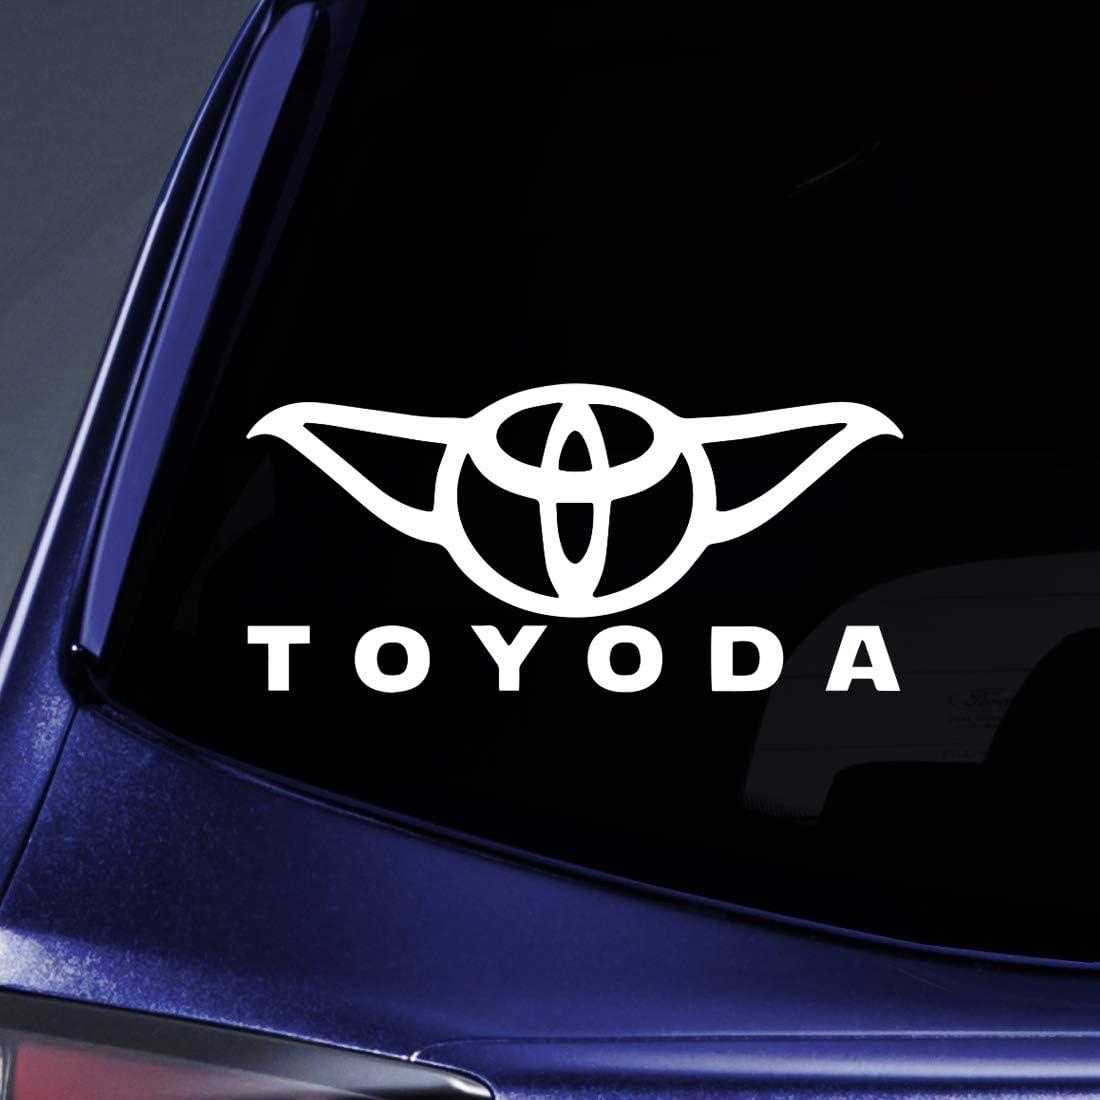 Bargain Luxury goods Max Decals - Albuquerque Mall Toyoda Yoda Car Decal Lapt Sticker Notebook